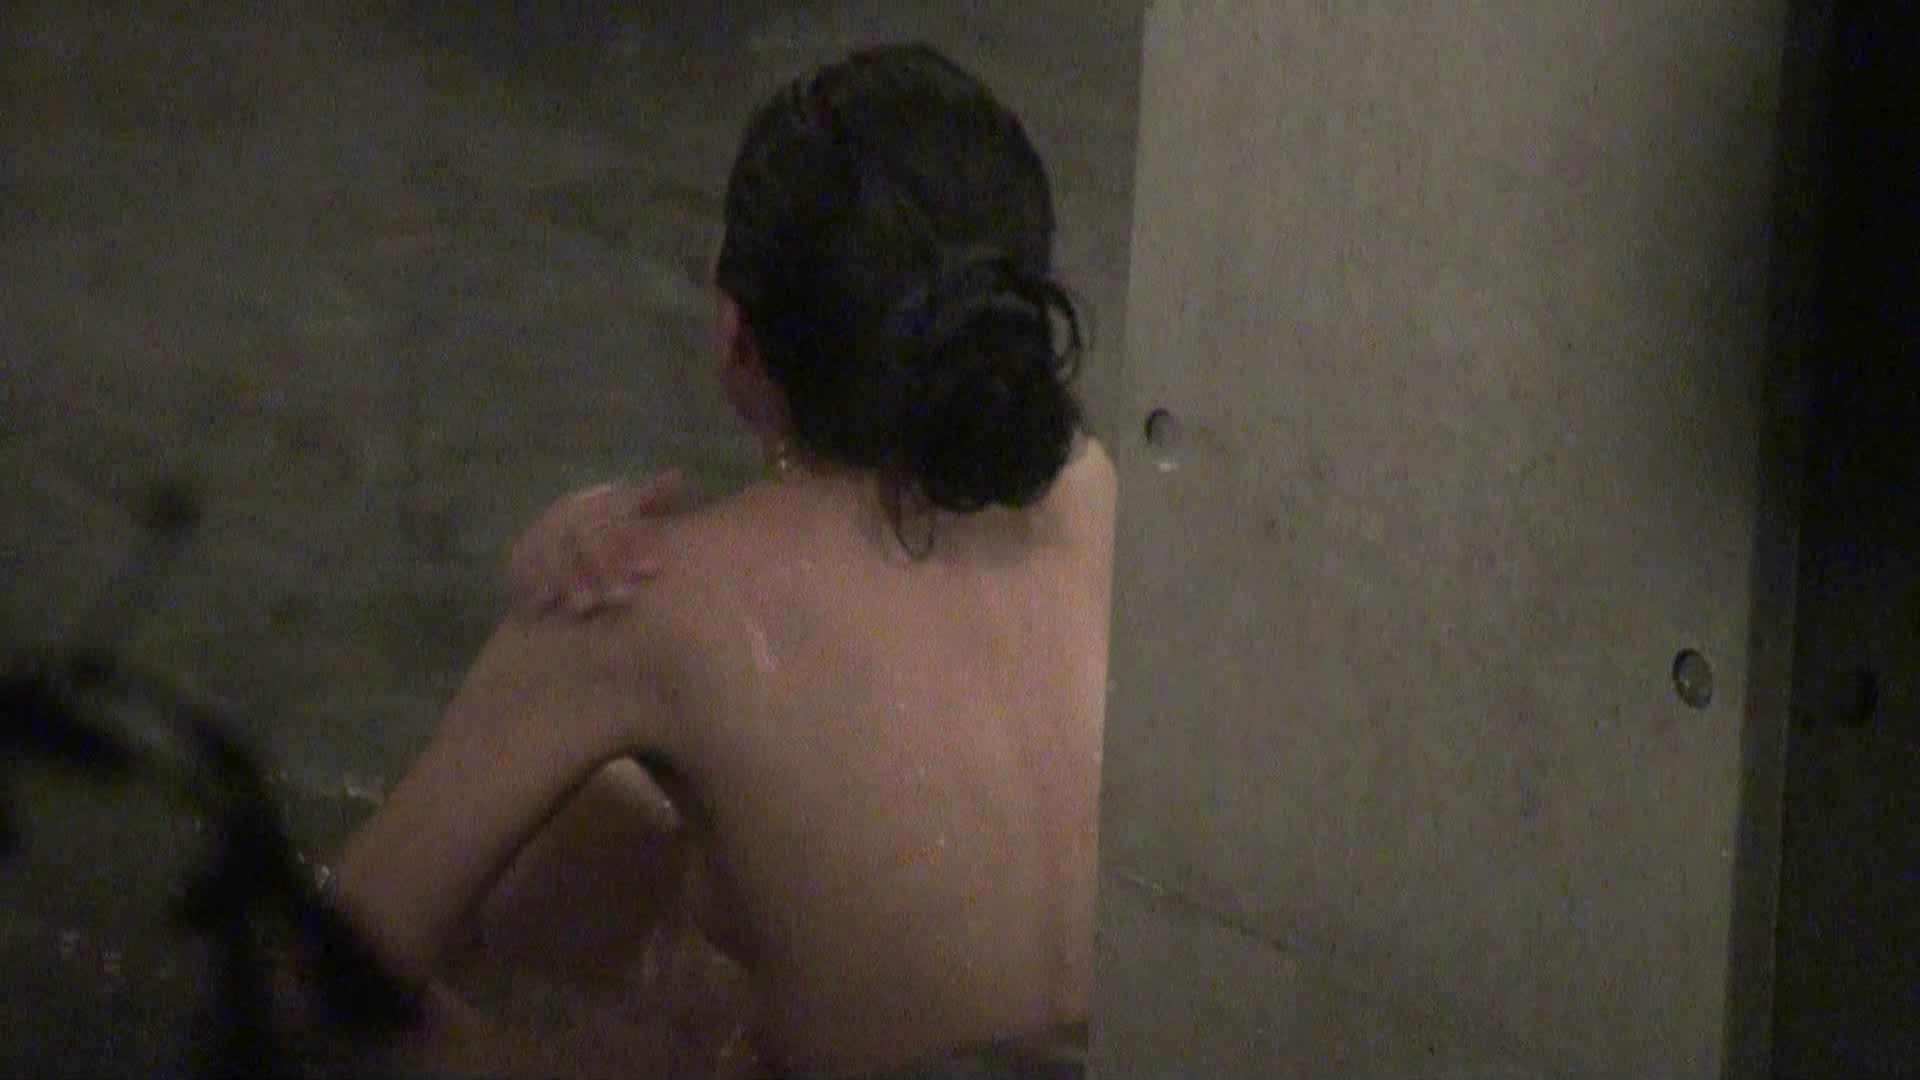 Aquaな露天風呂Vol.375 女体盗撮 | OL女体  106連発 103